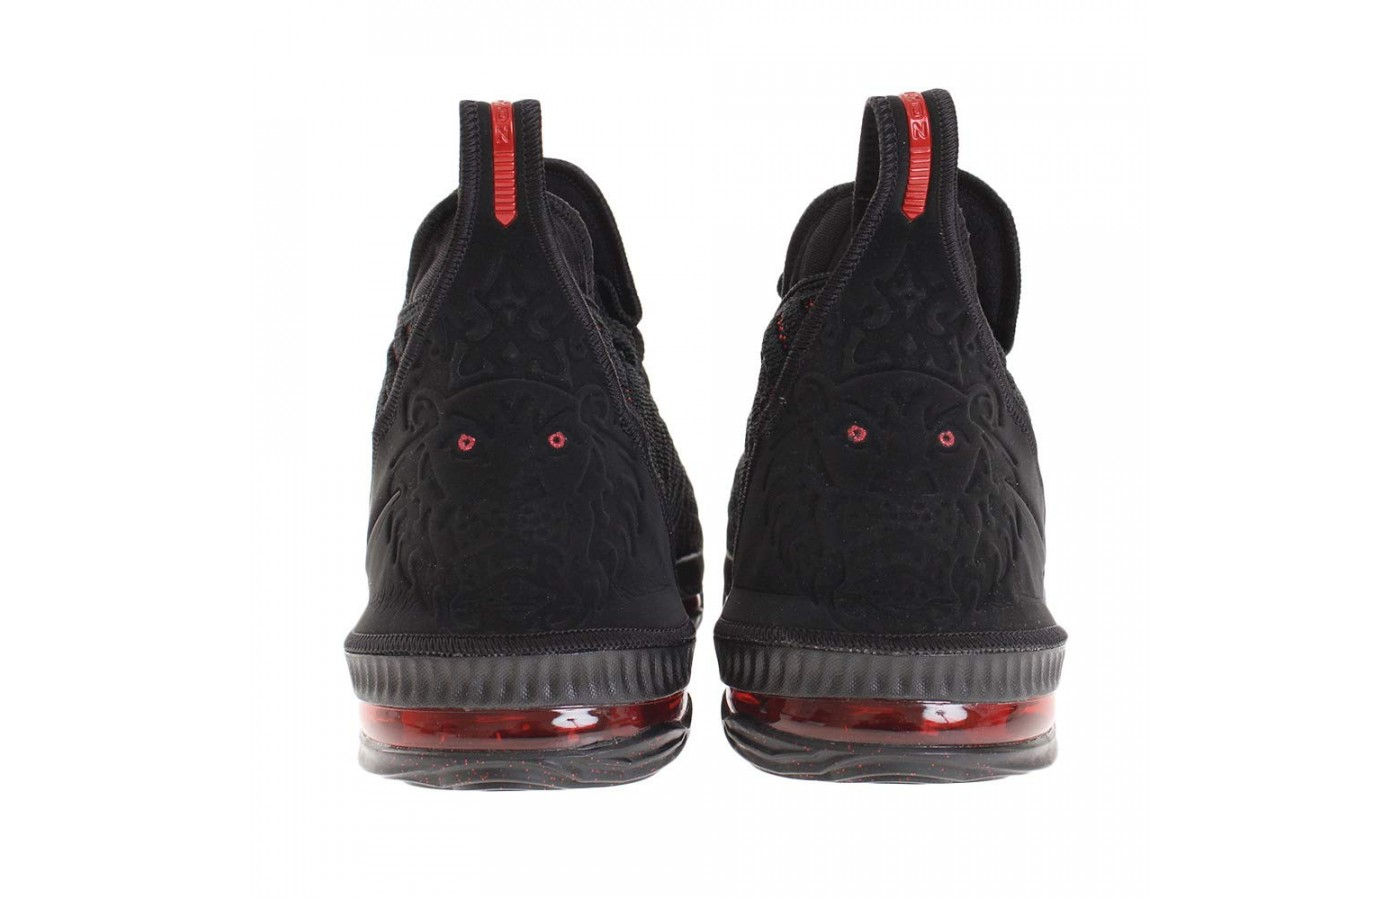 Adidas arkyn knit outsole